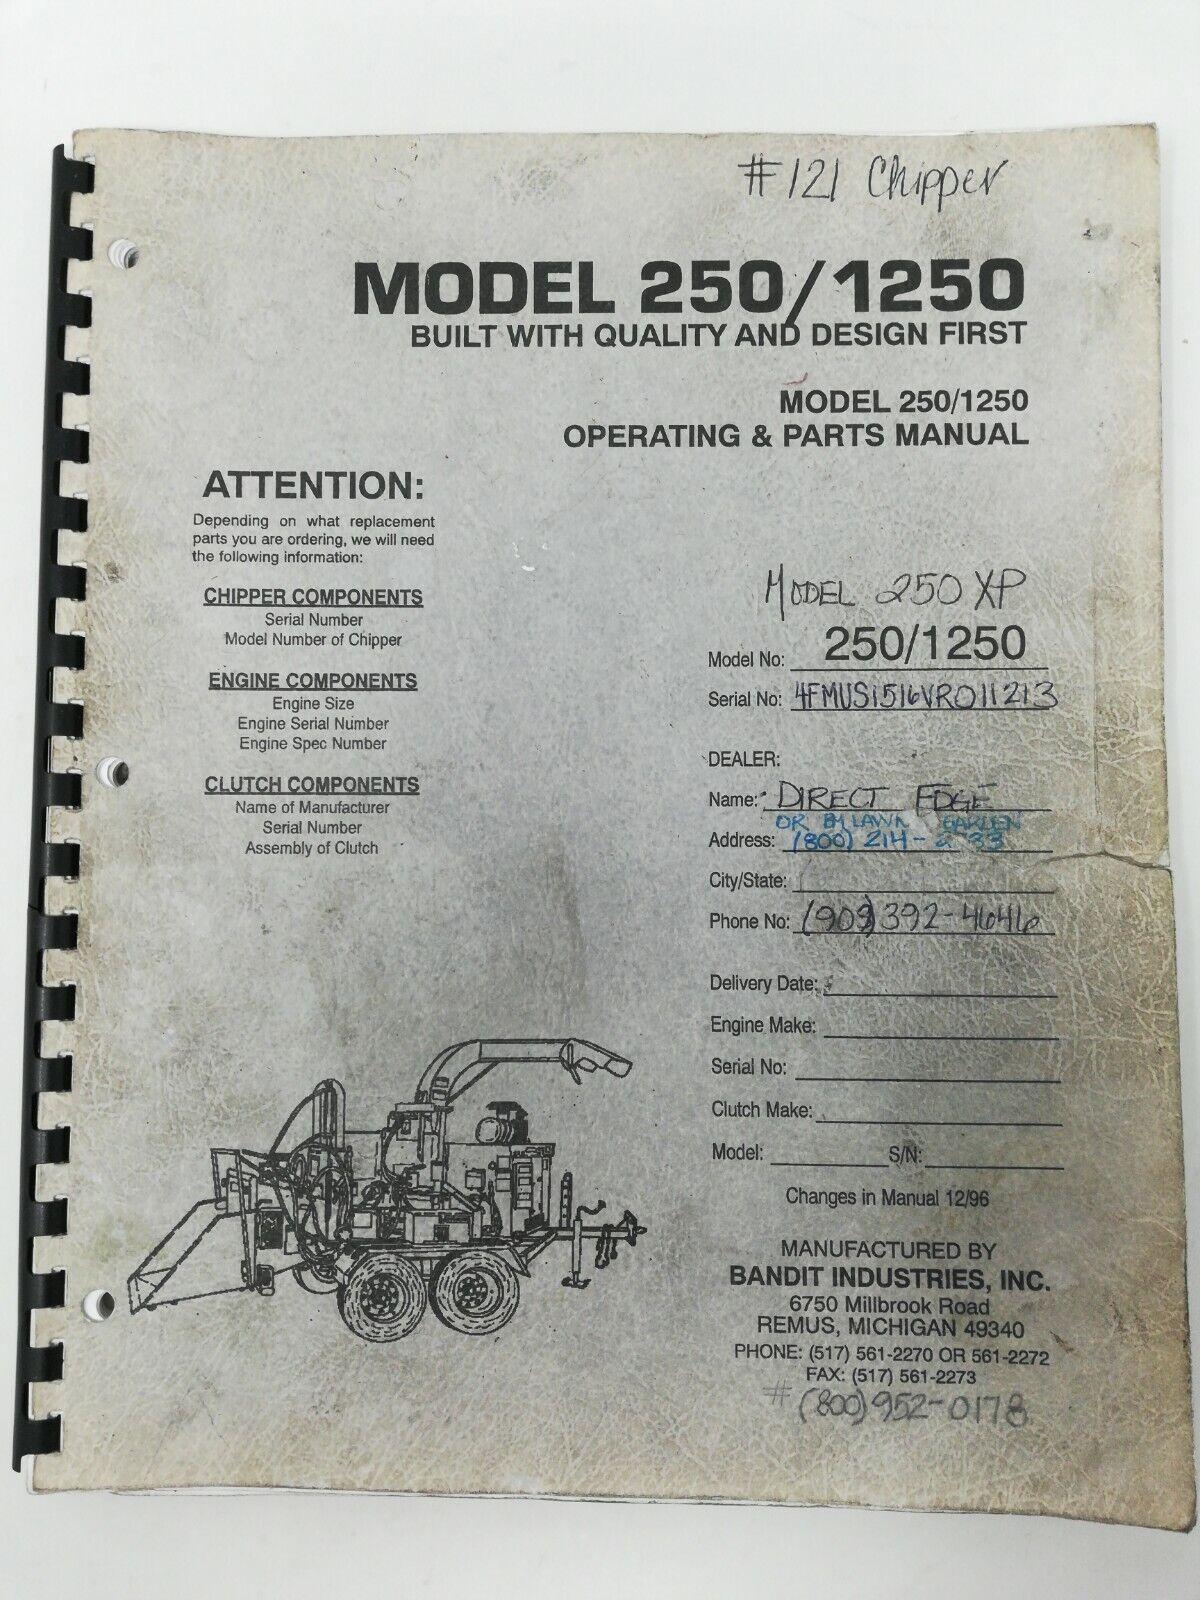 Bandit 250 Wood Chipper Parts Maintenance Service Manual for sale online |  eBay | Wood Chipper Engine Diagram |  | eBay